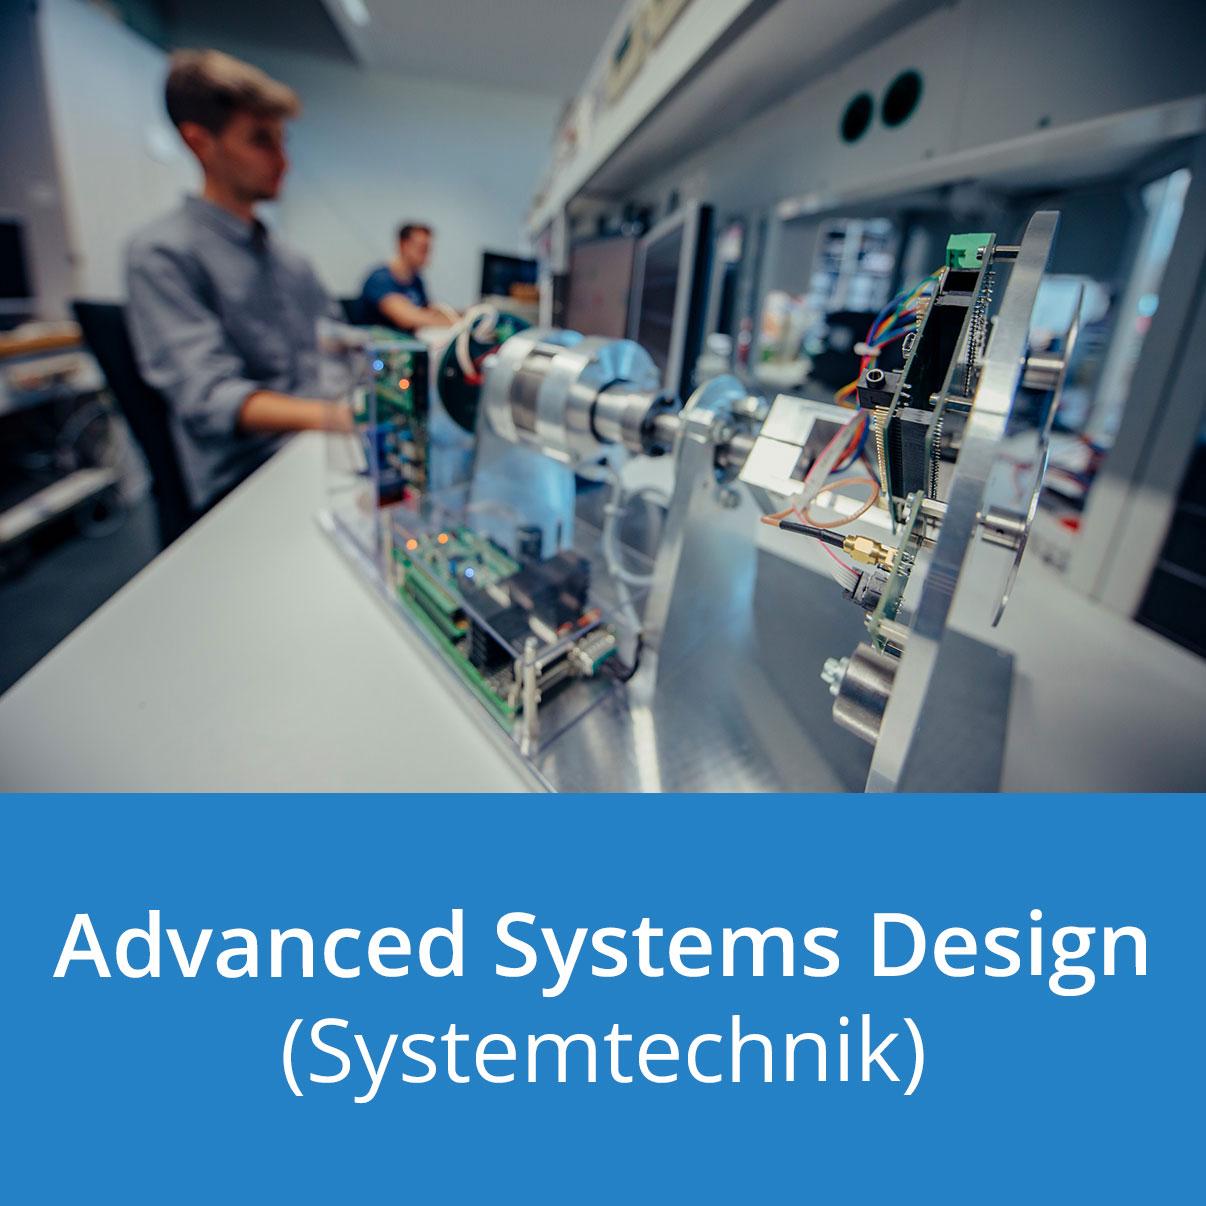 Advanced Systems Design (Systemtechnik)